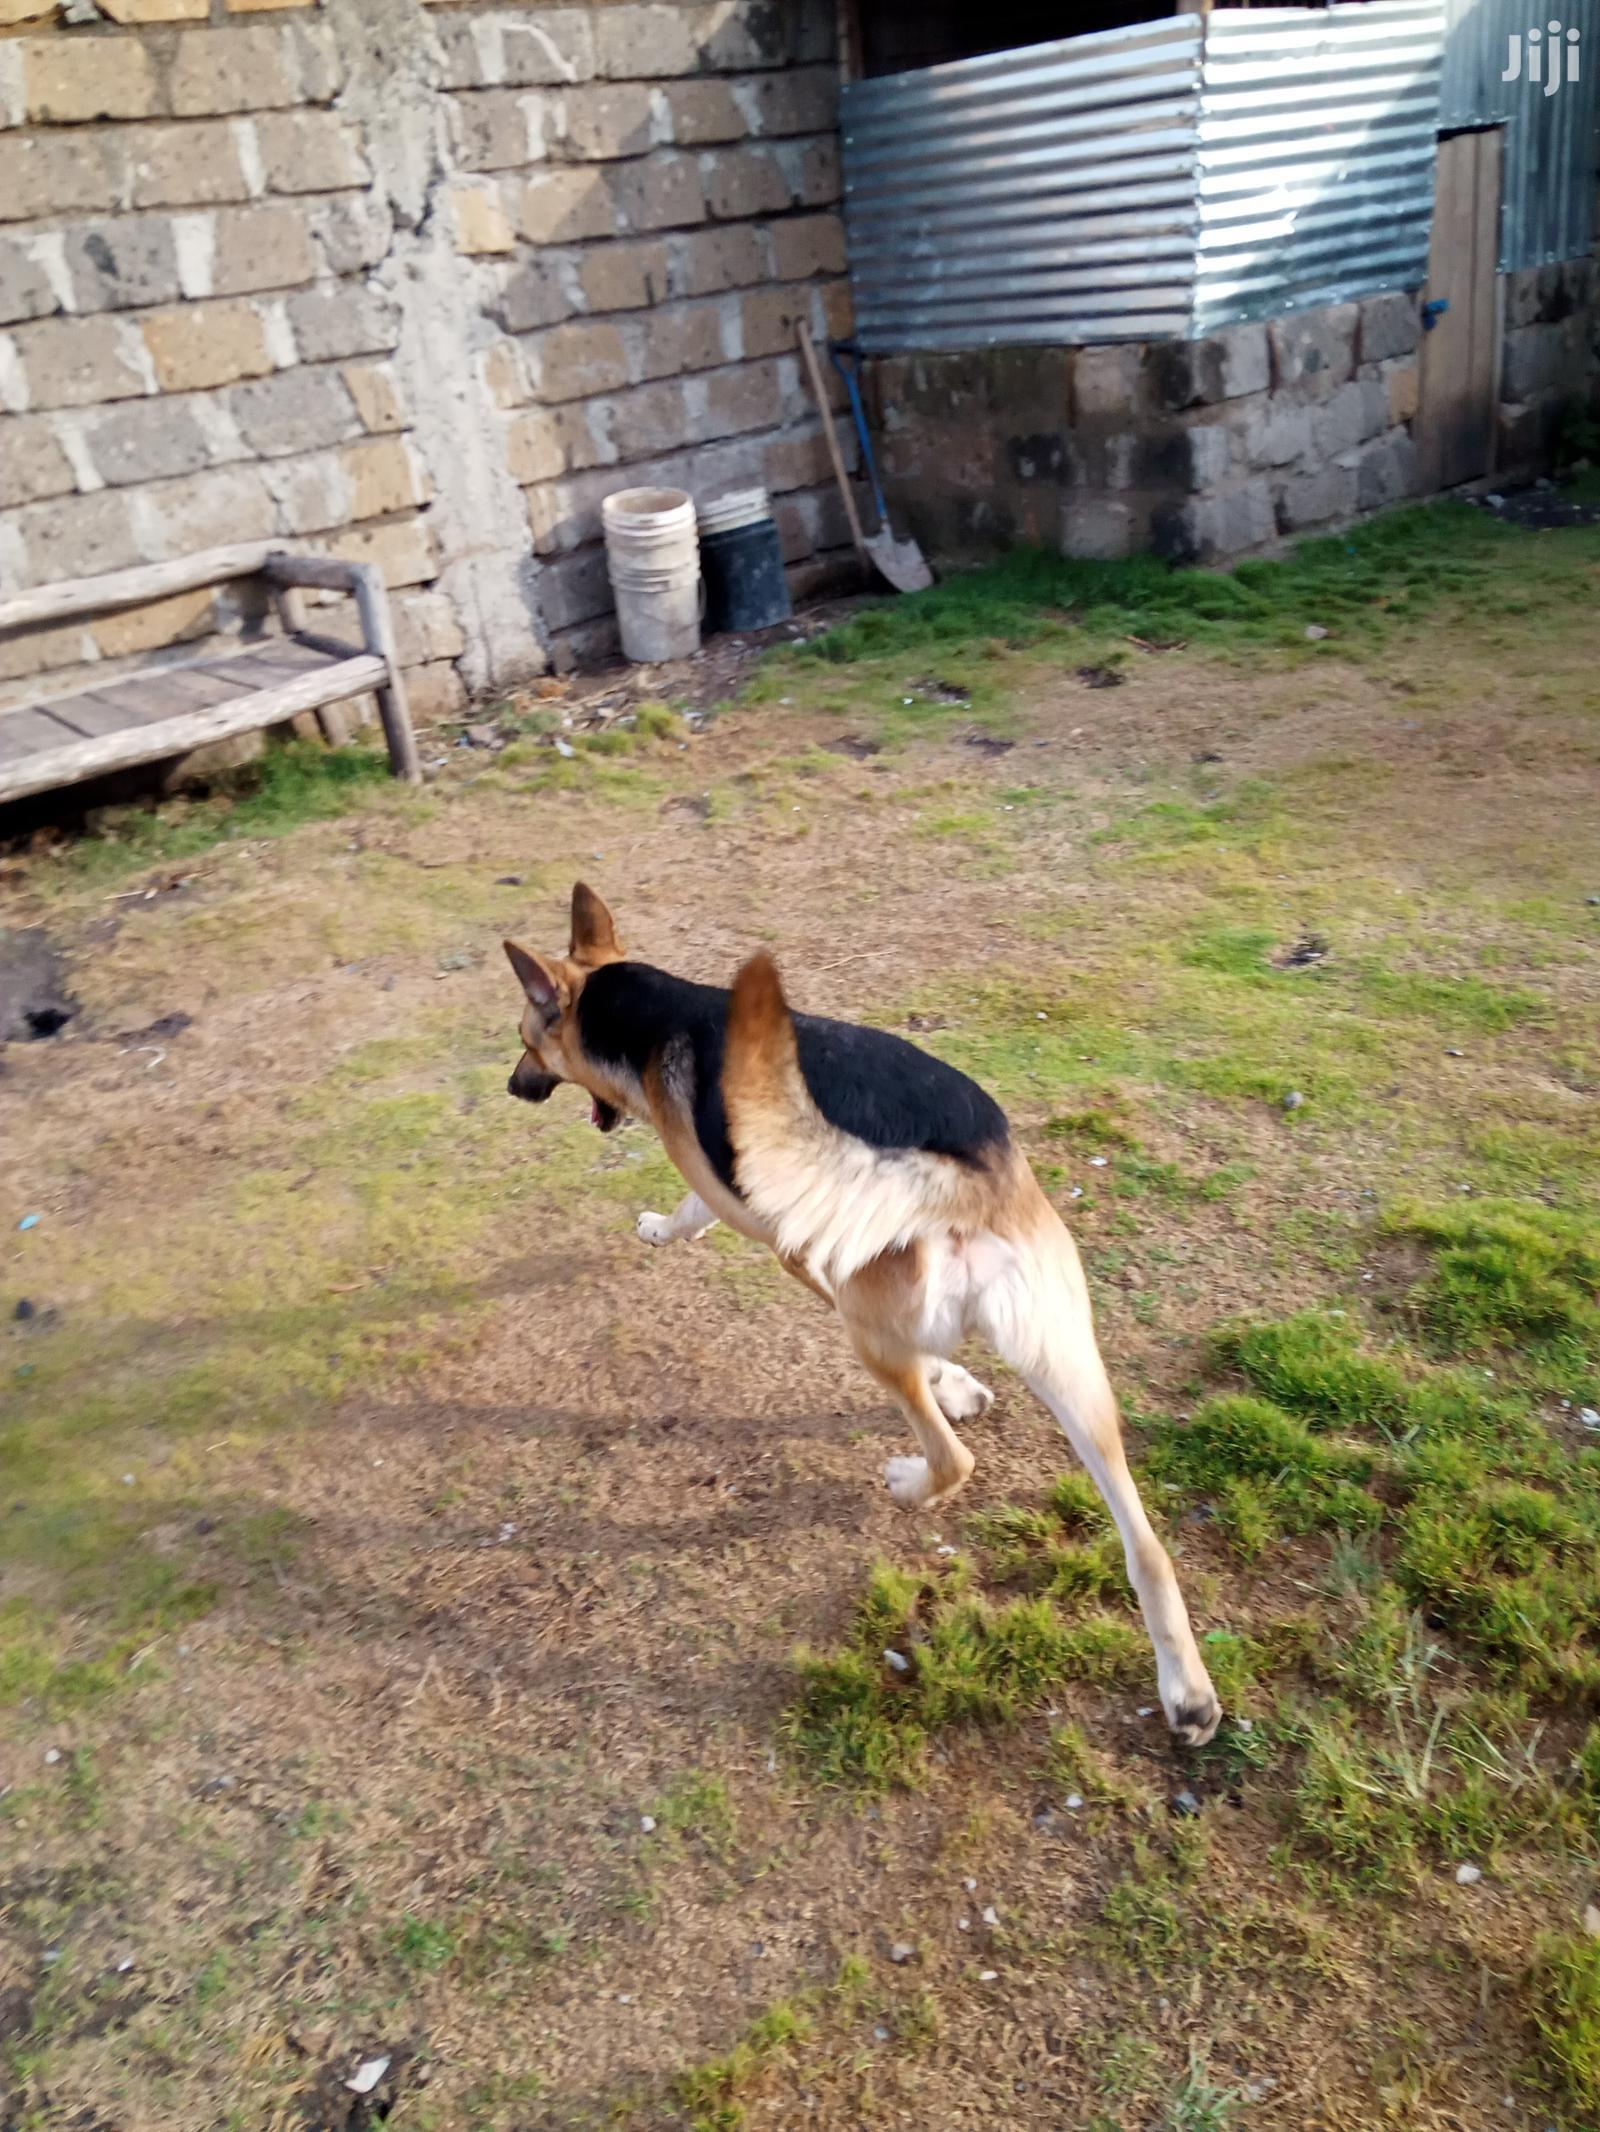 1+ Year Male Purebred German Shepherd | Dogs & Puppies for sale in Nairobi Central, Nairobi, Kenya